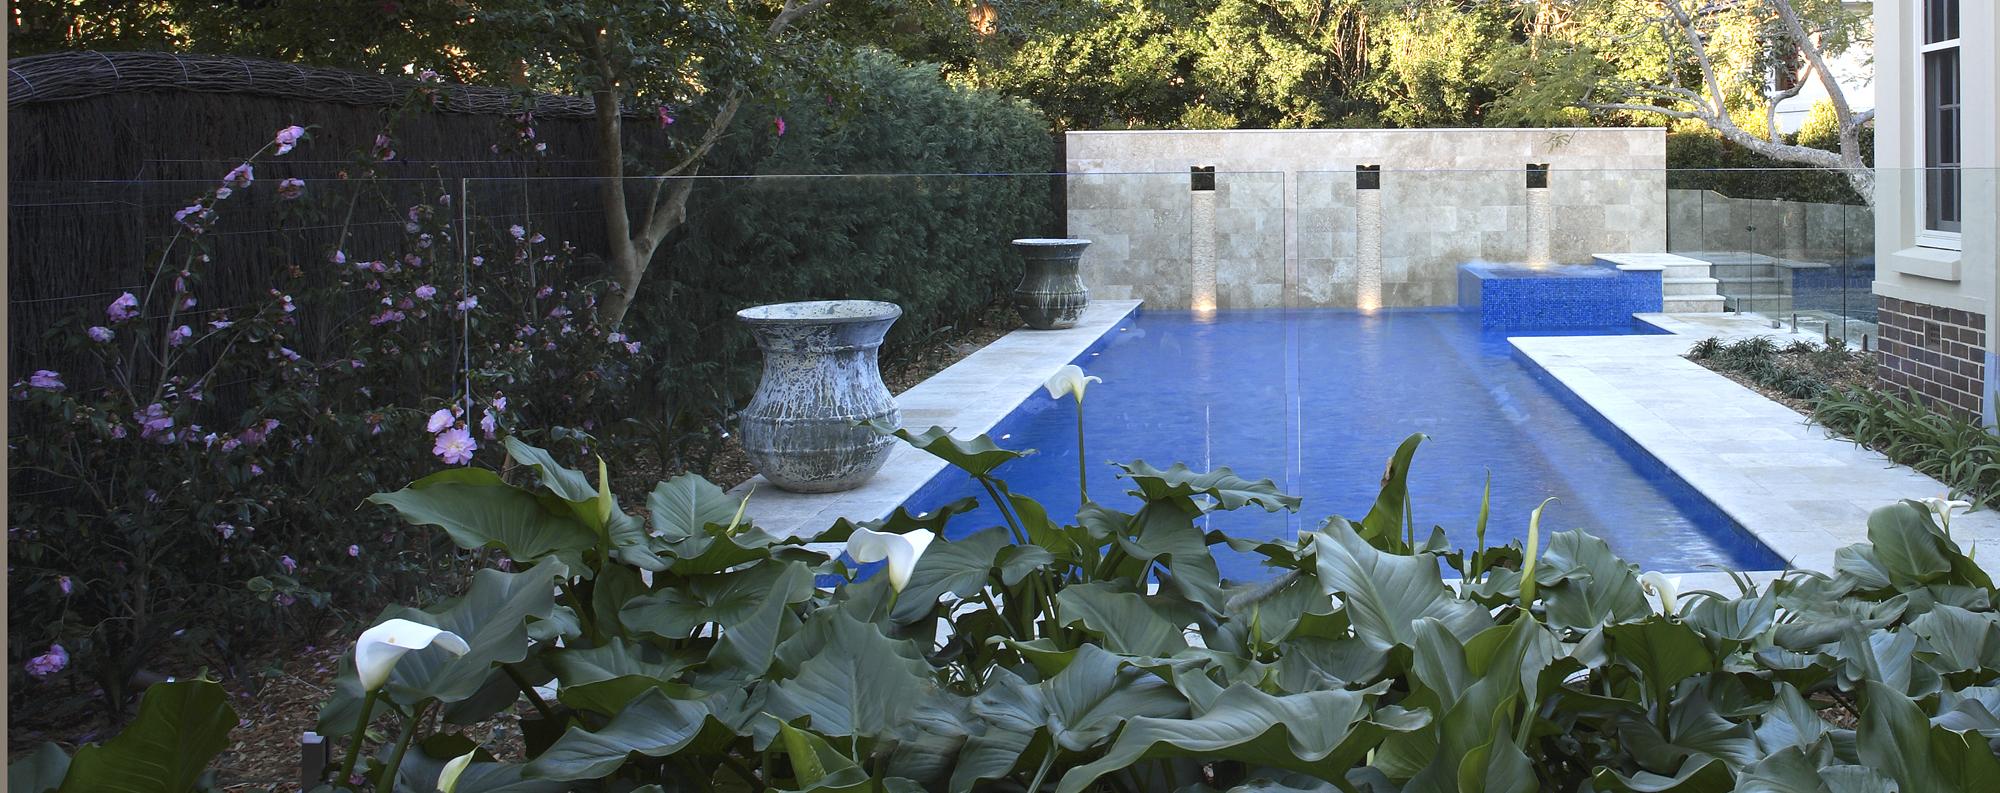 Peter glass kambala for Pool designs under 30000